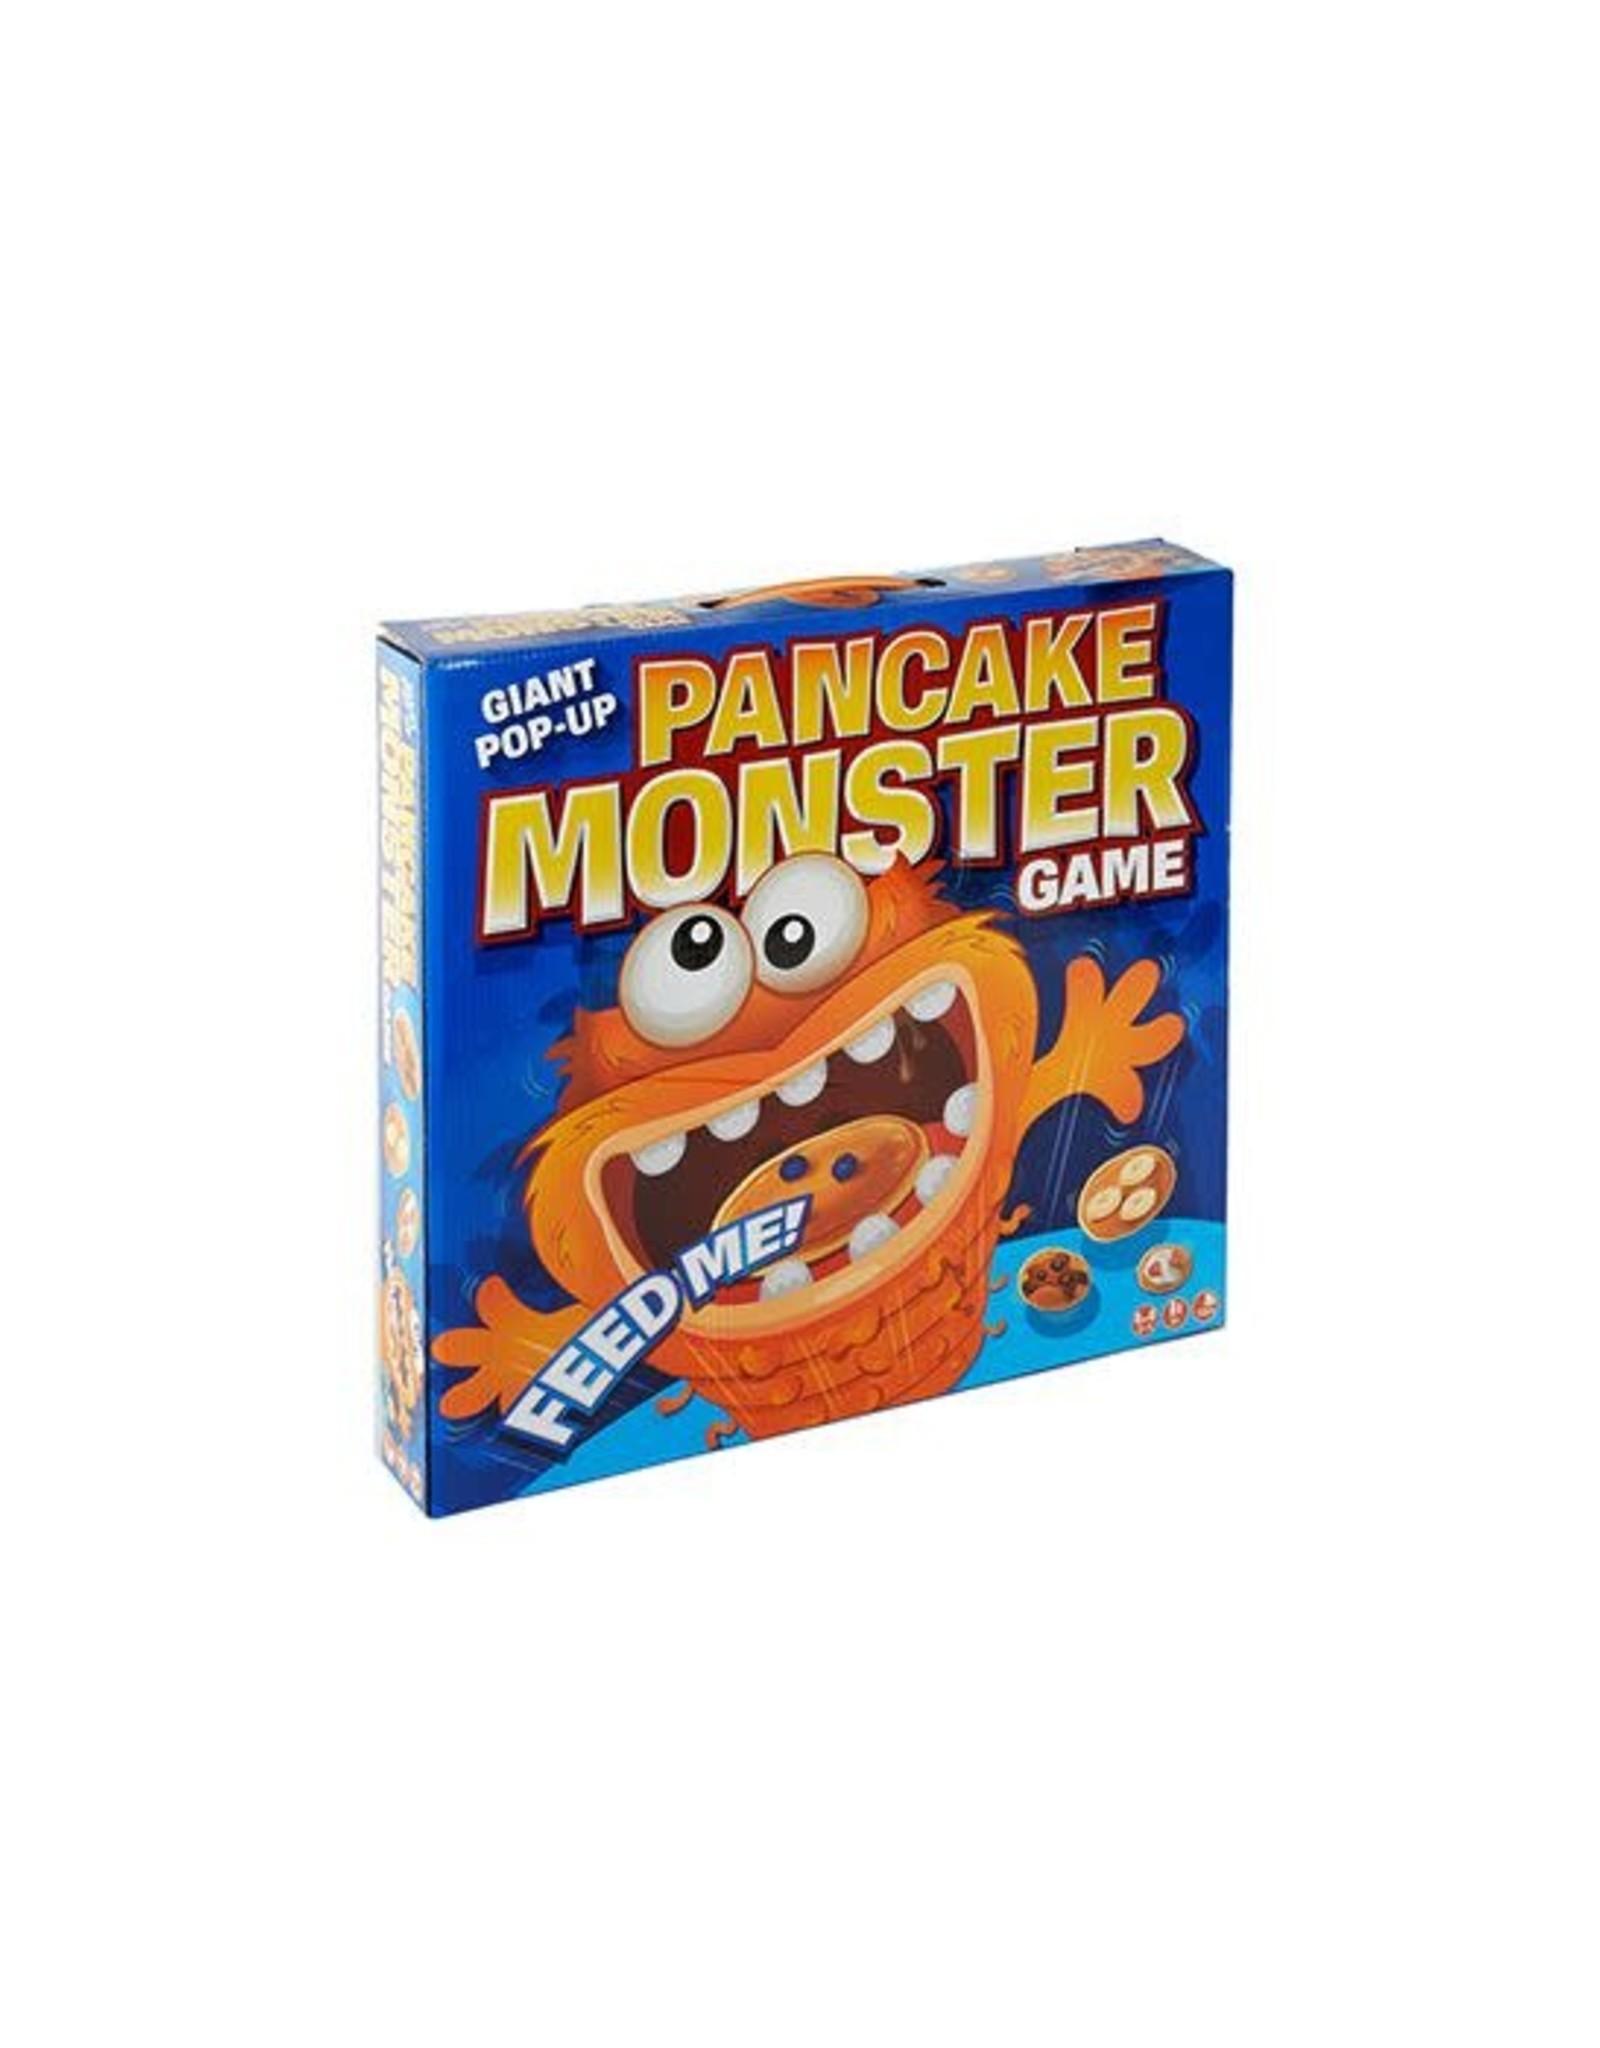 Giant Pop-Up Pancake Monster Game